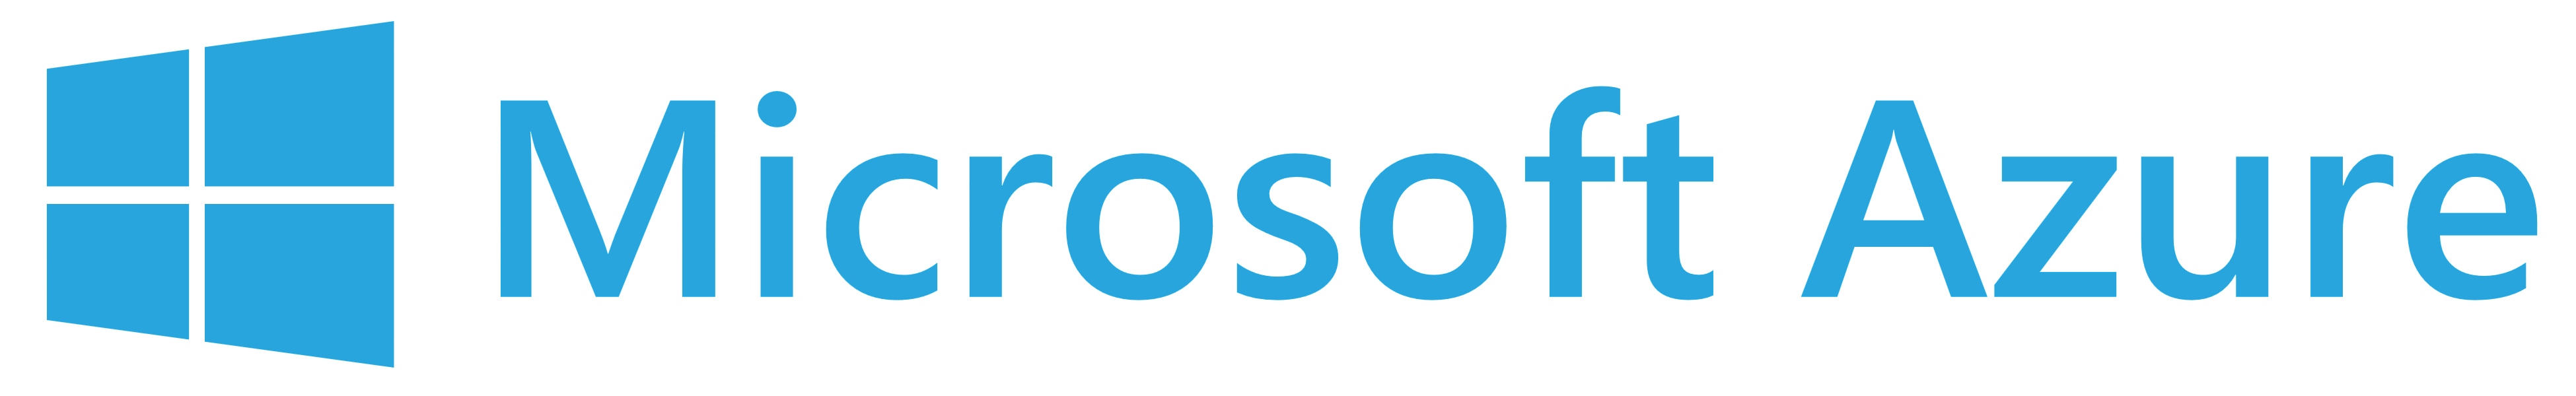 Microsoft_Azure_logo_wordmark